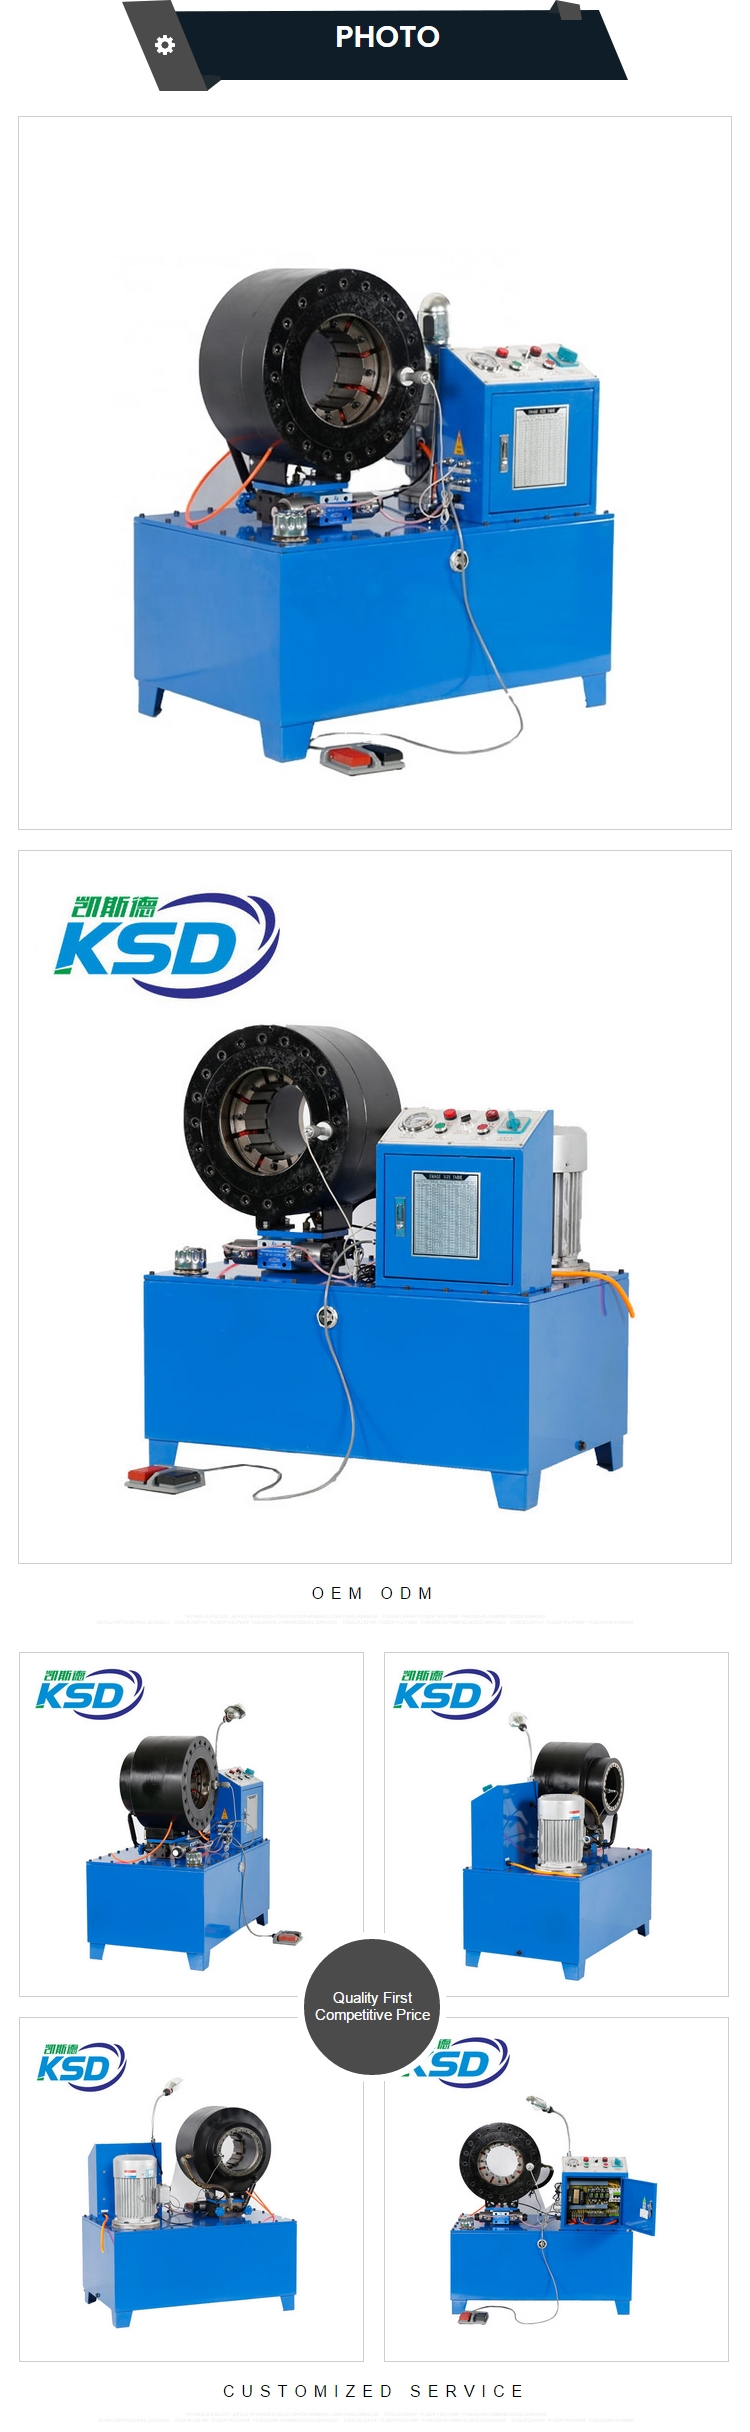 "CE 1/4-4"" 6-102mm hose pipe press 220V single phase hydraulic hose crimping machine"